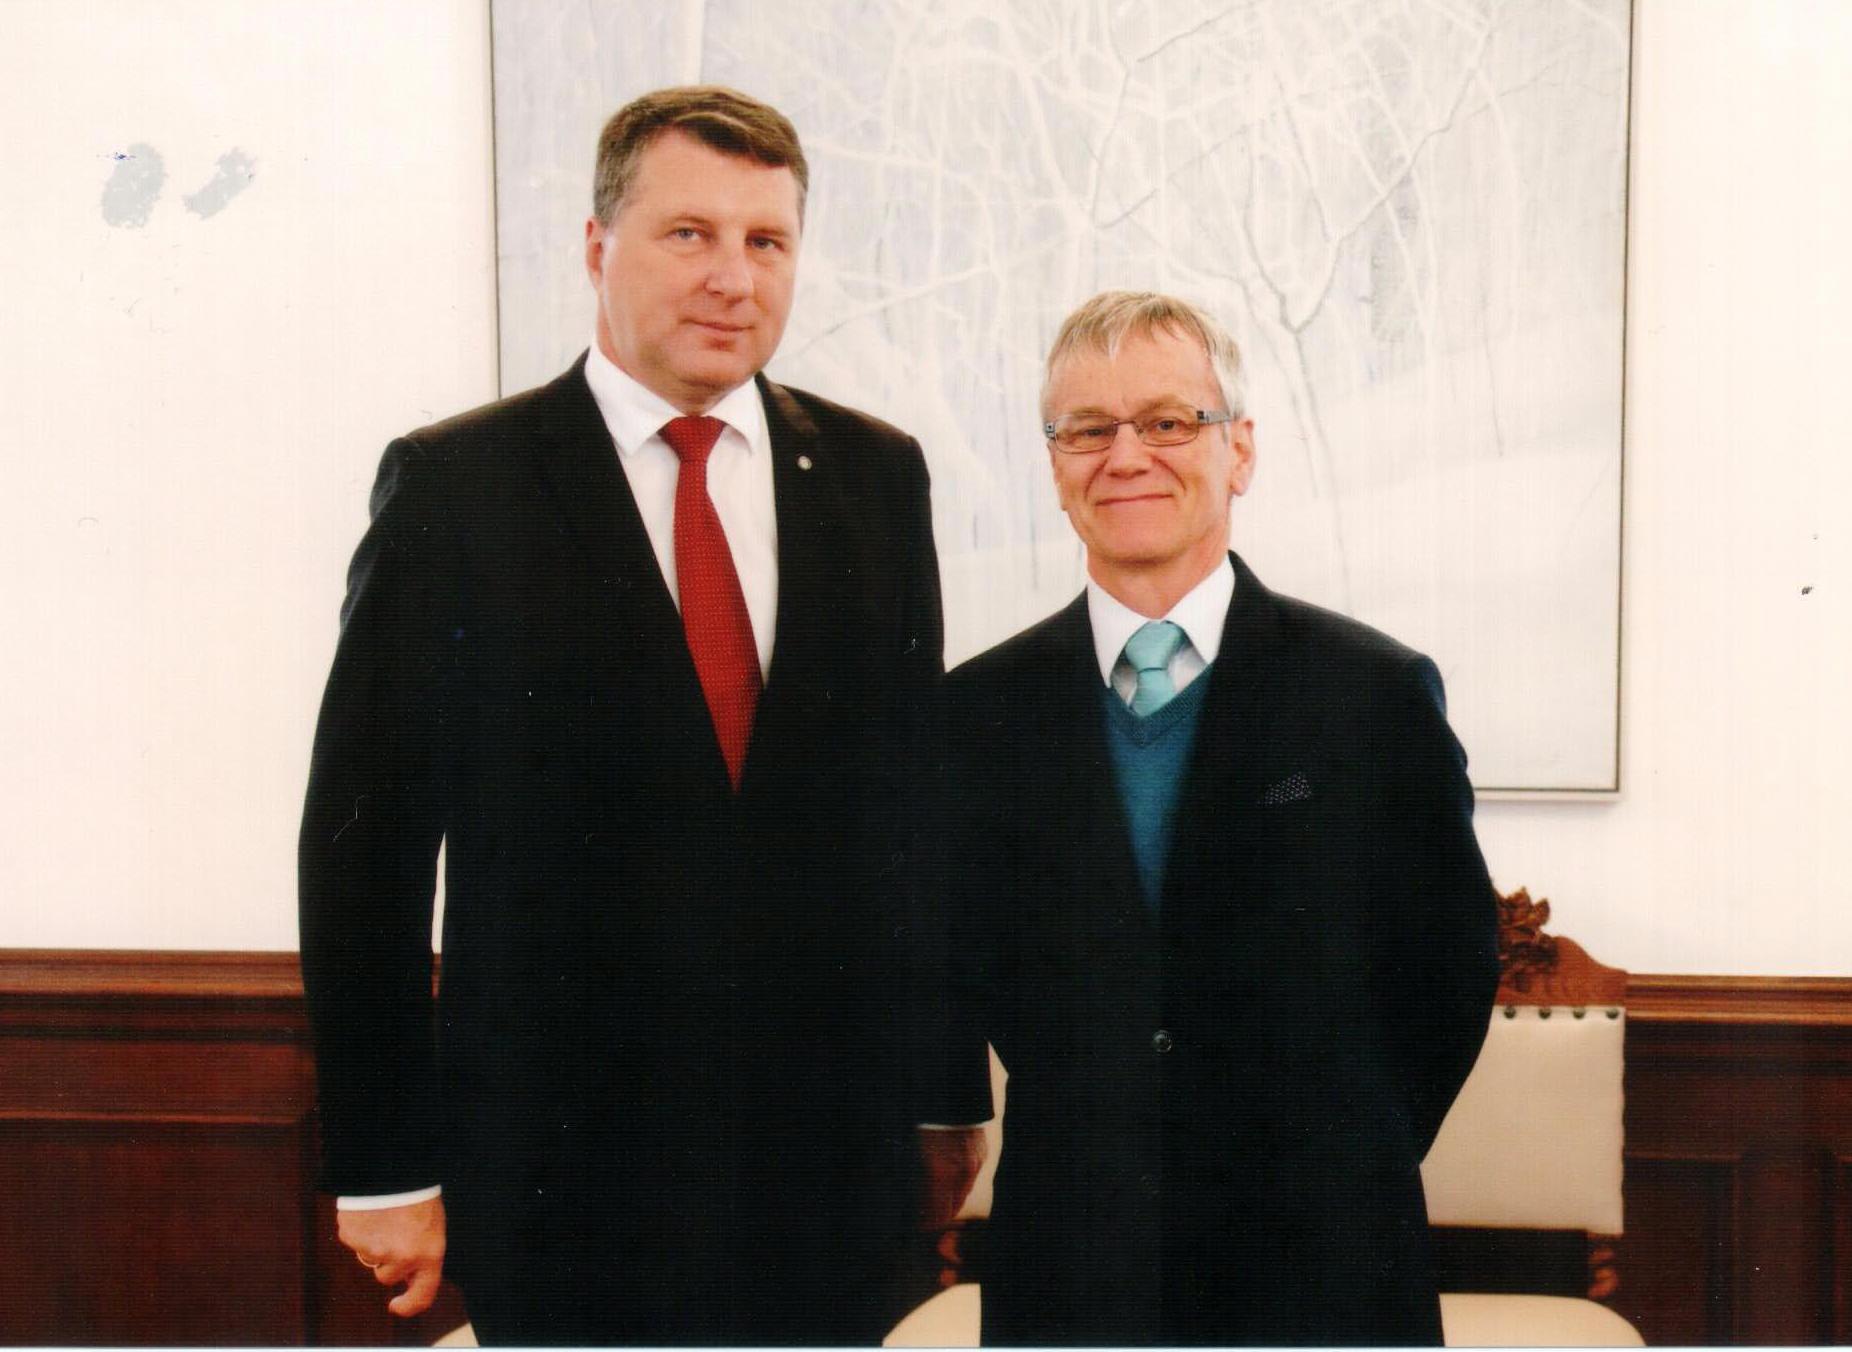 The current President of Latvia Raimonds Vejonis: biography, family, career 57